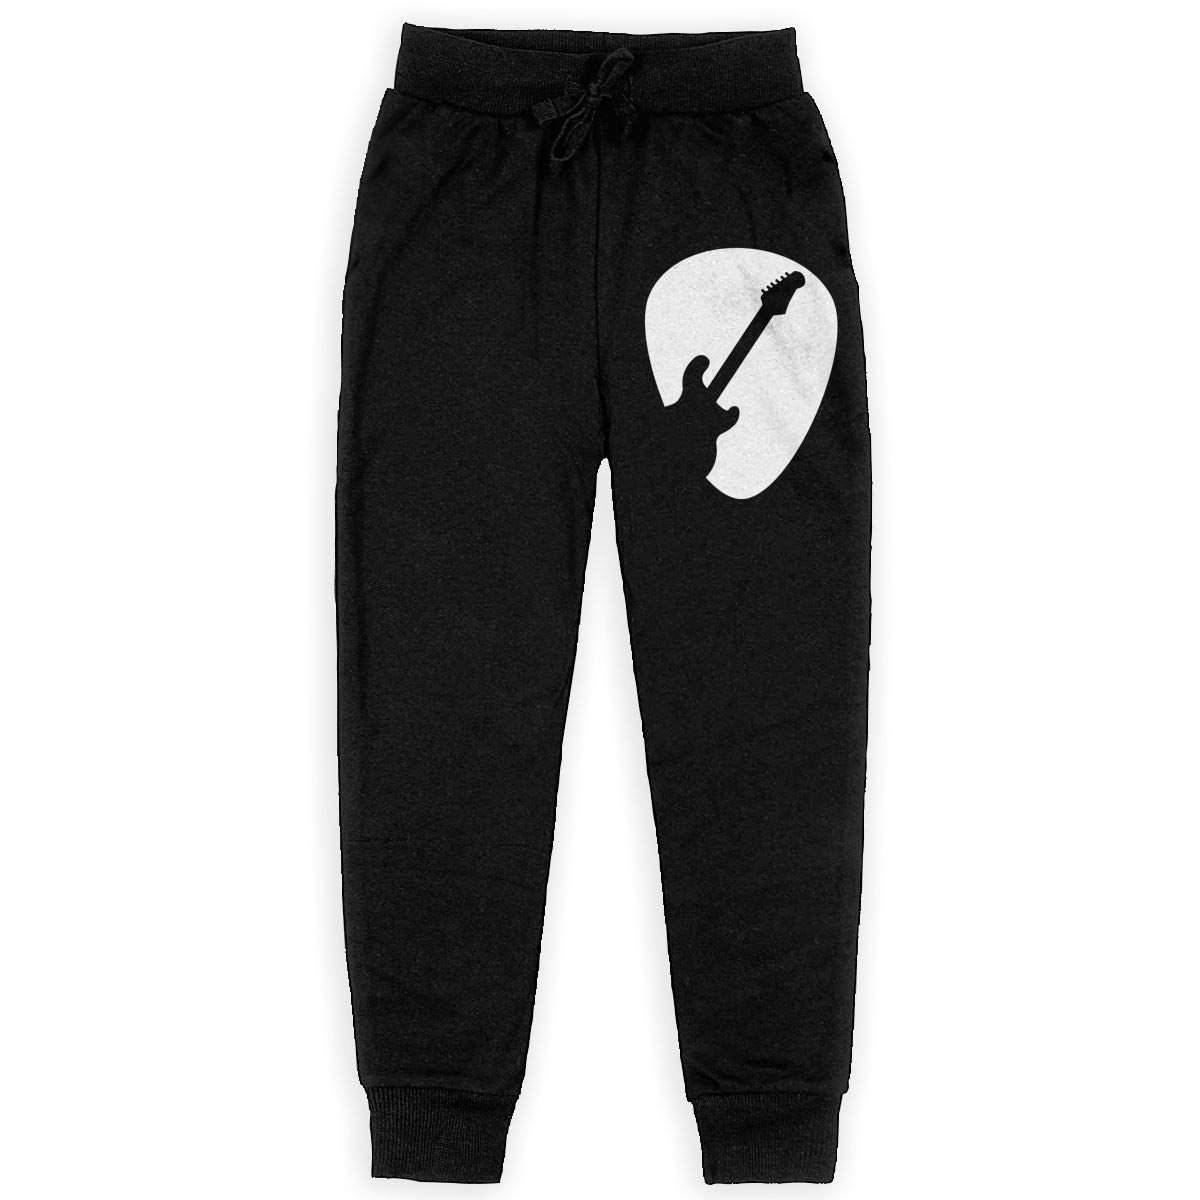 Guitar Pick Silhouette Soft//Cozy Sweatpants Boys Active Pants for Teenager Boys